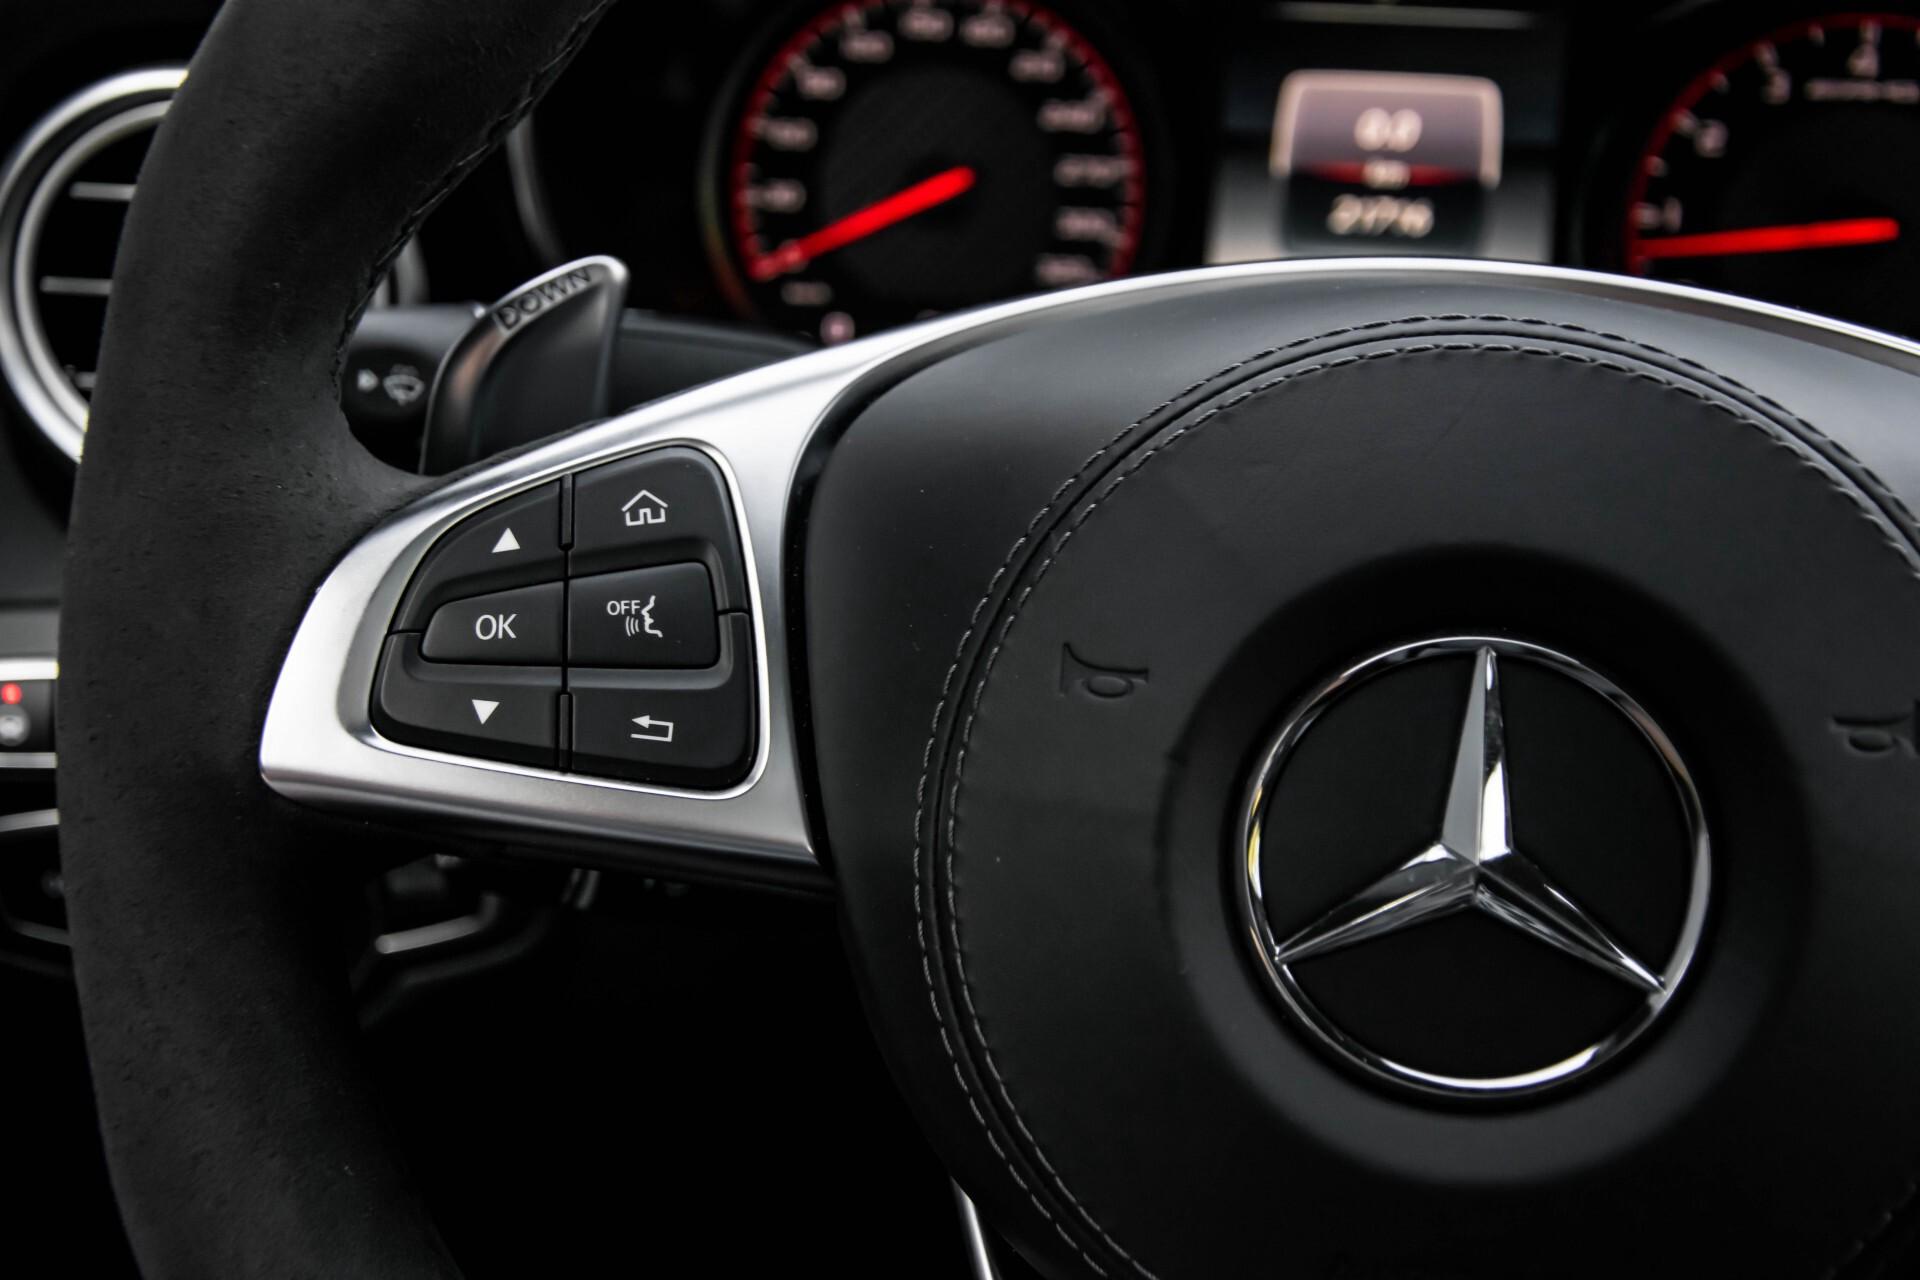 Mercedes-Benz C-Klasse 63 AMG S Panorama/Distronic/Keyless/Comand/Camera/ILS Aut7 Foto 8